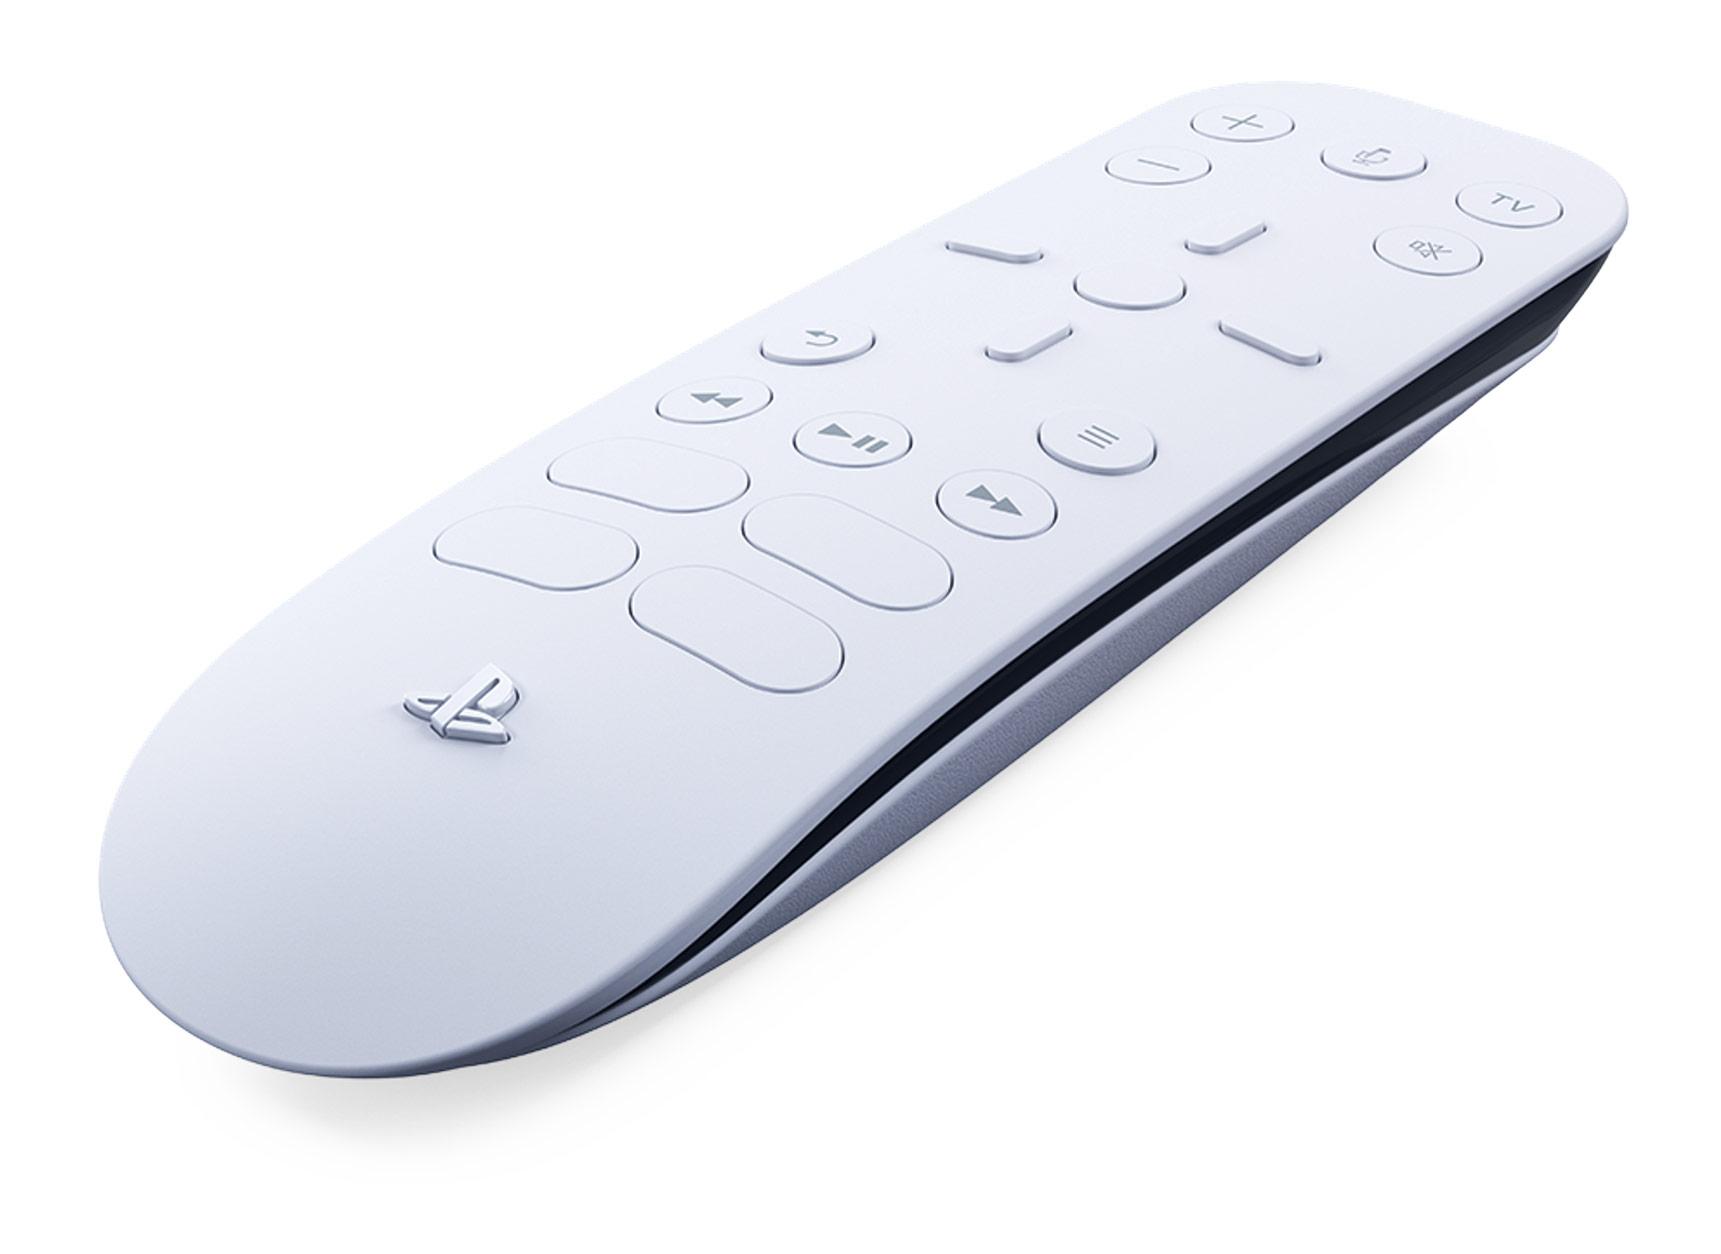 Sony PS5 Remote - xcite.com